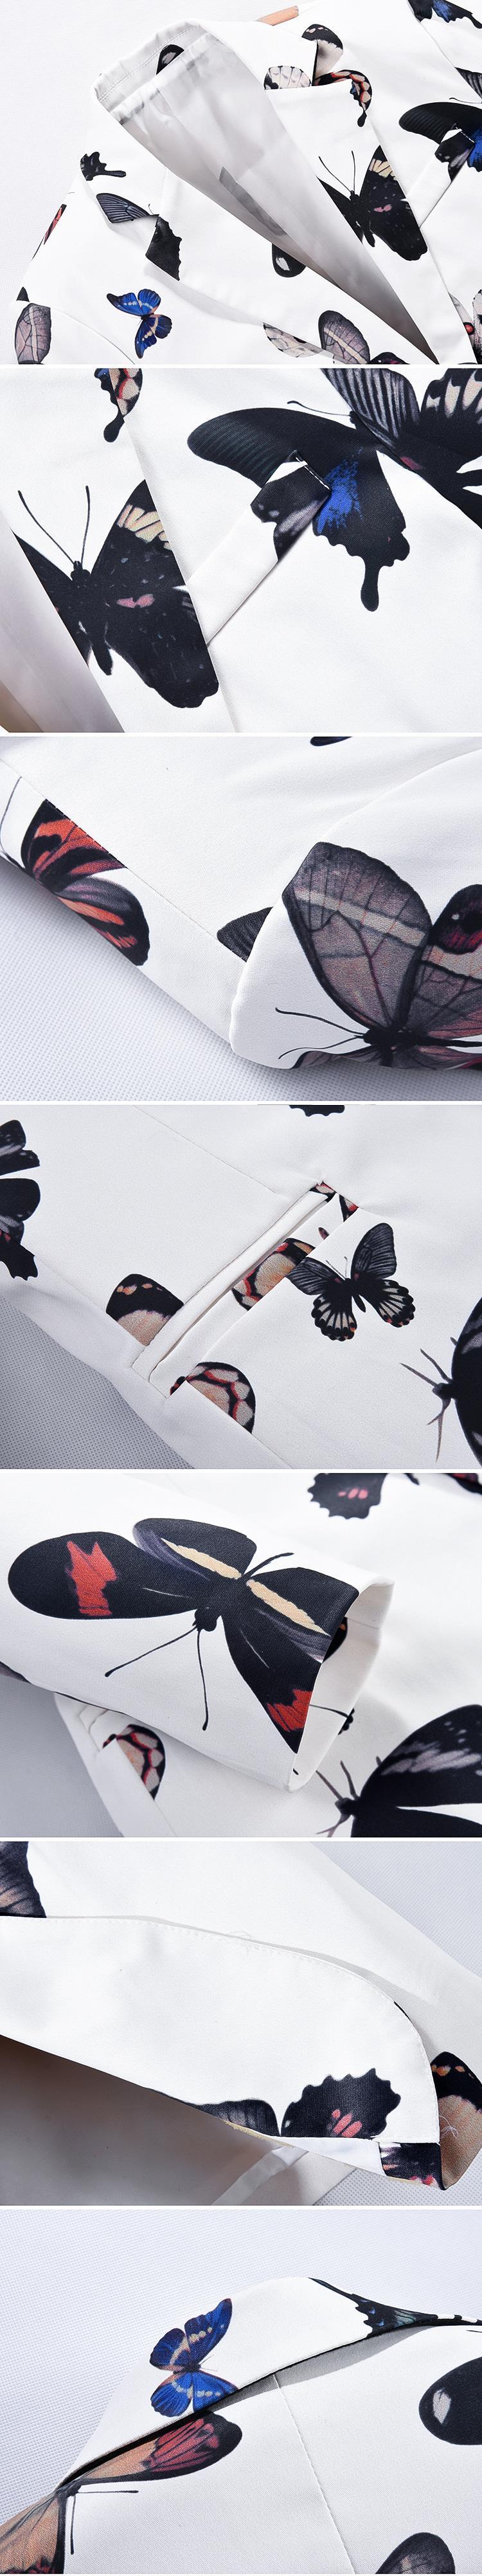 HTB130Yle1ALL1JjSZFjq6ysqXXaS - Men's Floral Blazer Butterfly Printing Suit Jacket Dress Blazer Slim Wedding Veste Homme Mariage Brand-clothing Free Shipping